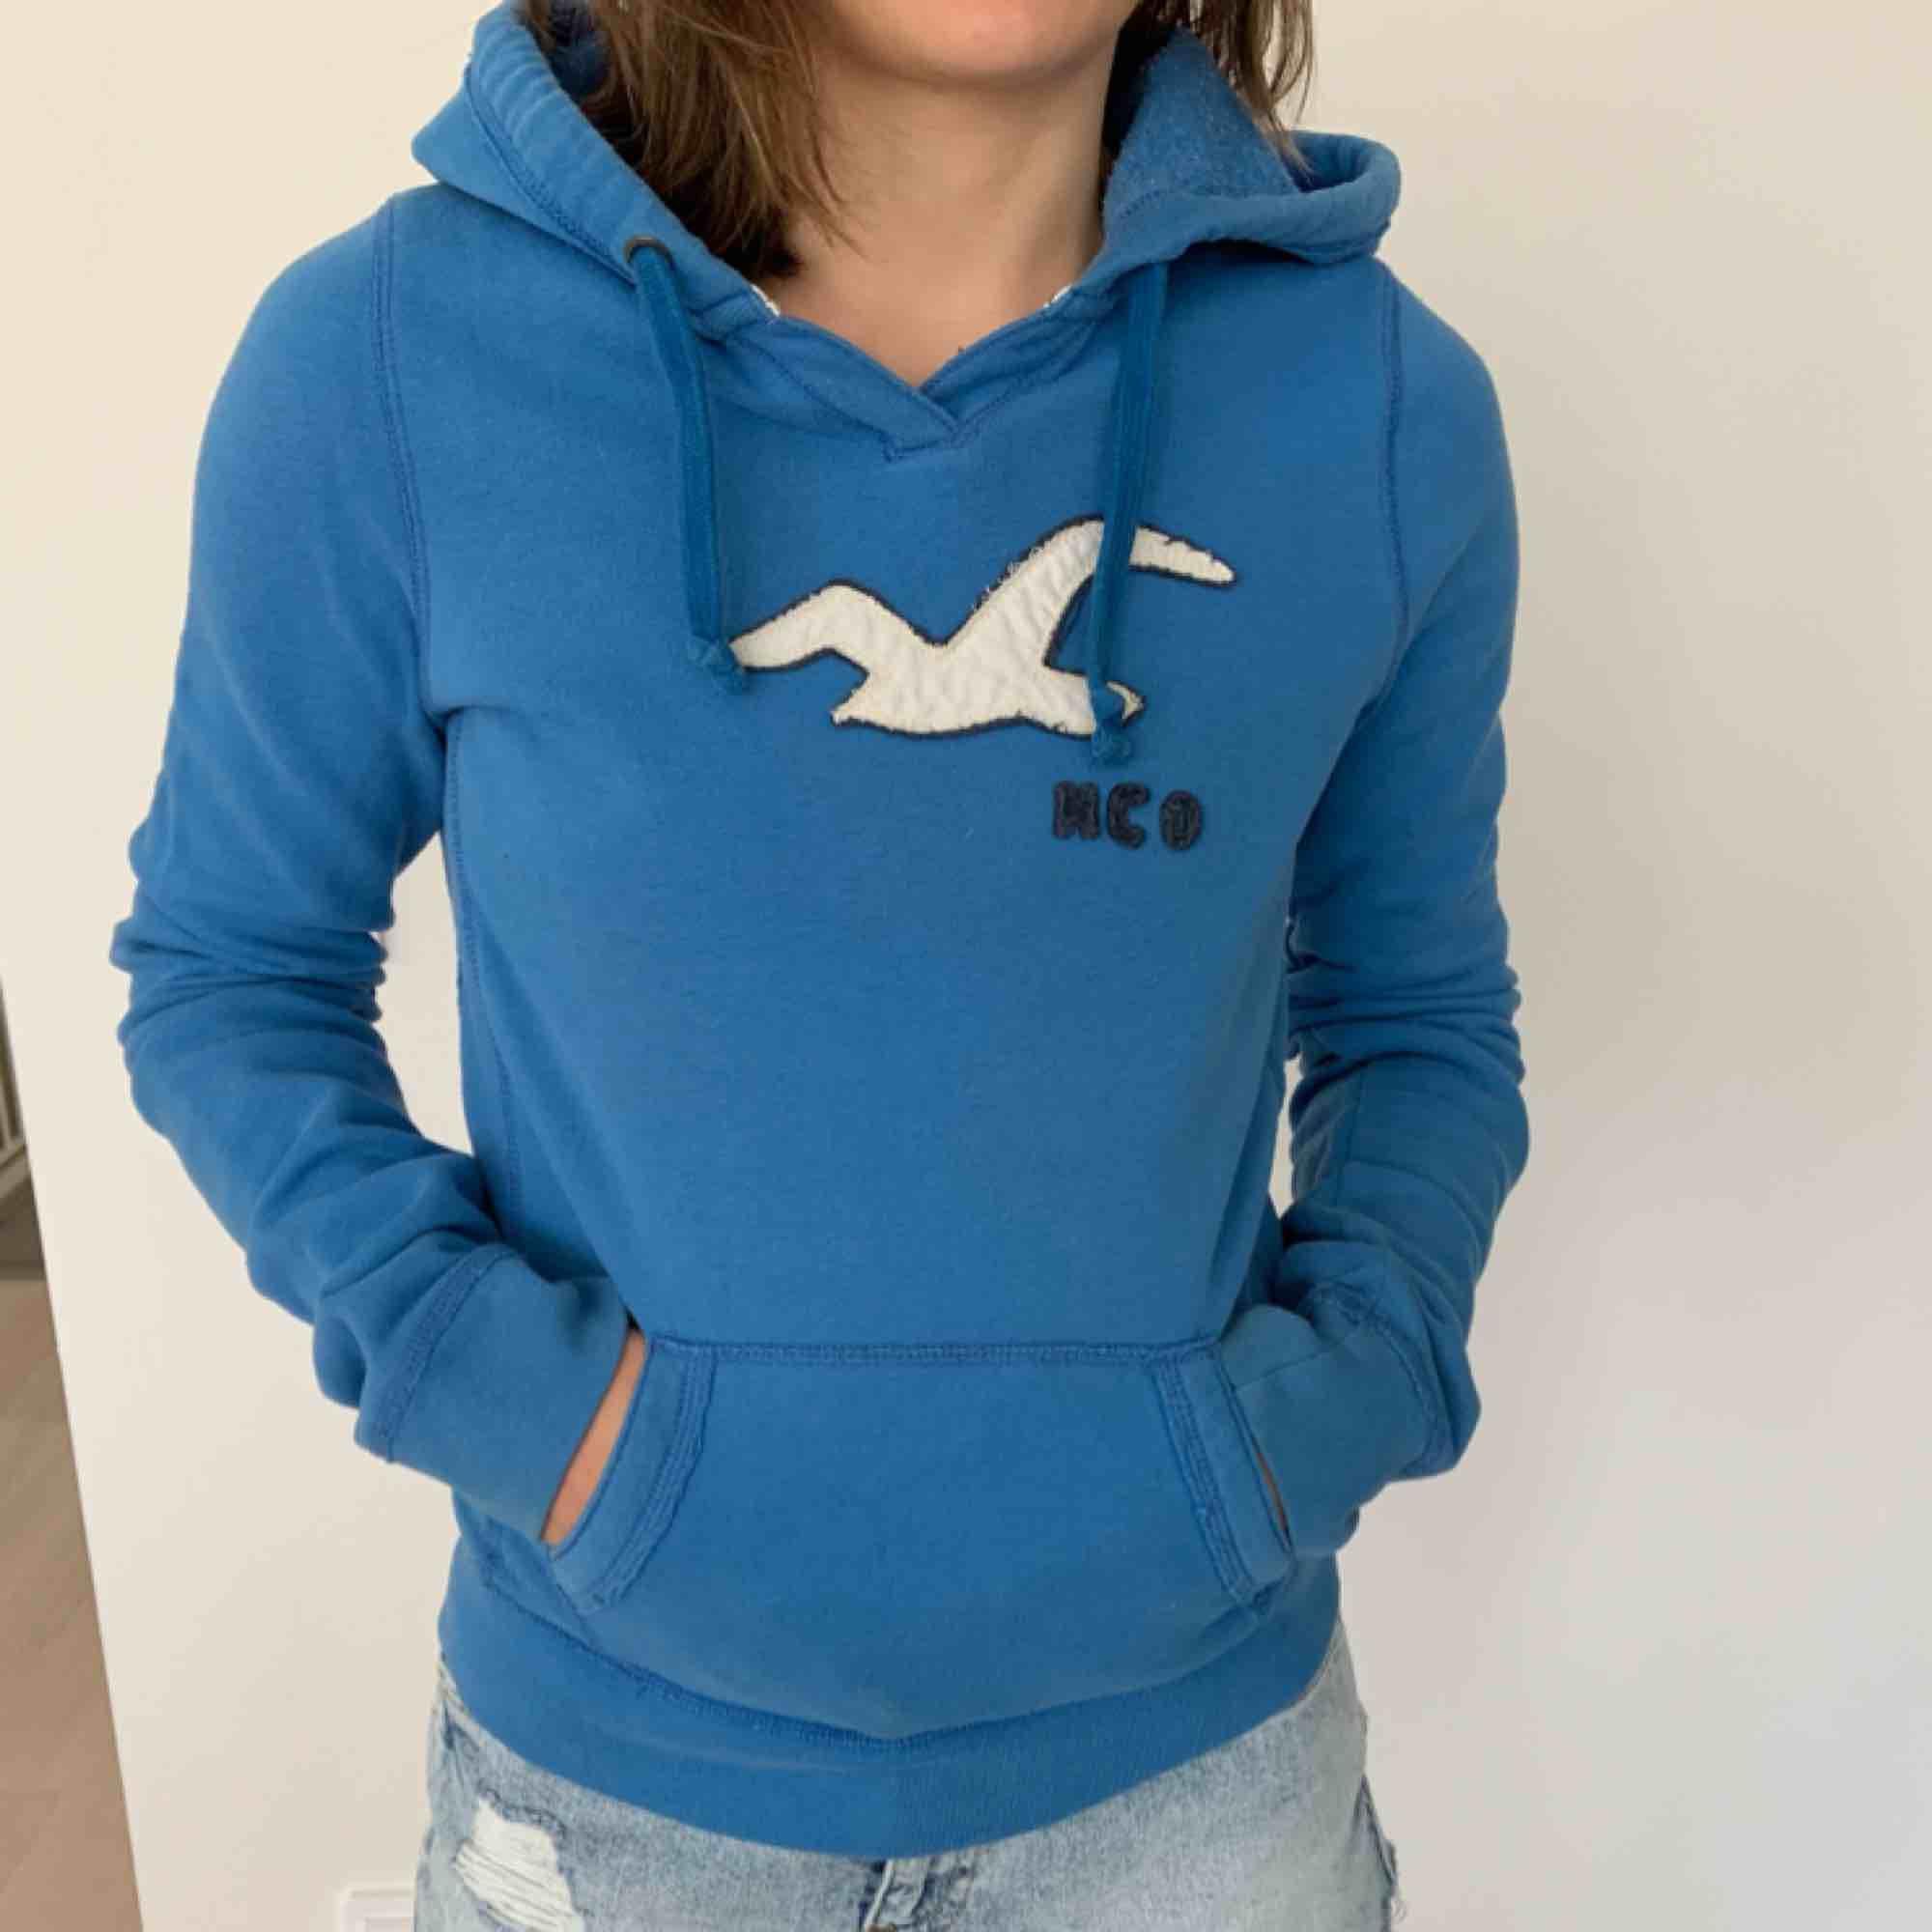 Hollister Hoodie Bright Blue Size: M So comfy!!. Huvtröjor & Träningströjor.